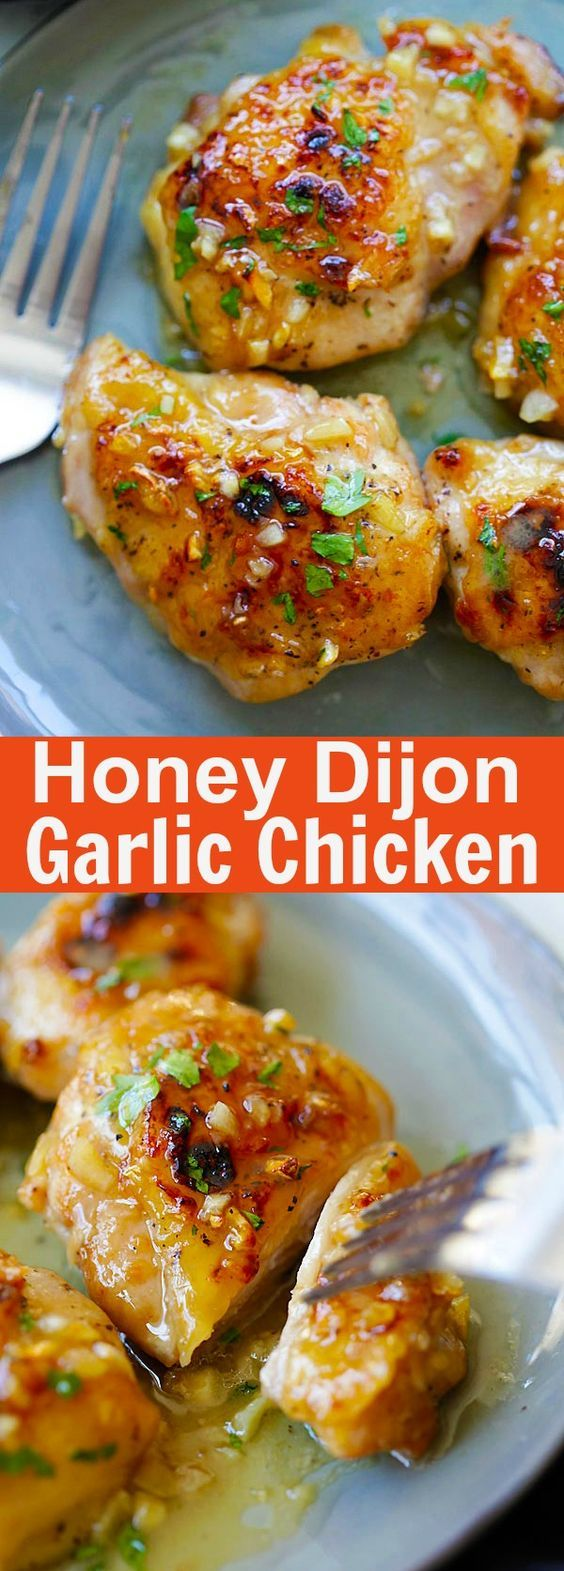 Honey Dijon Garlic Chicken Recipe | Cake And Food Recipe